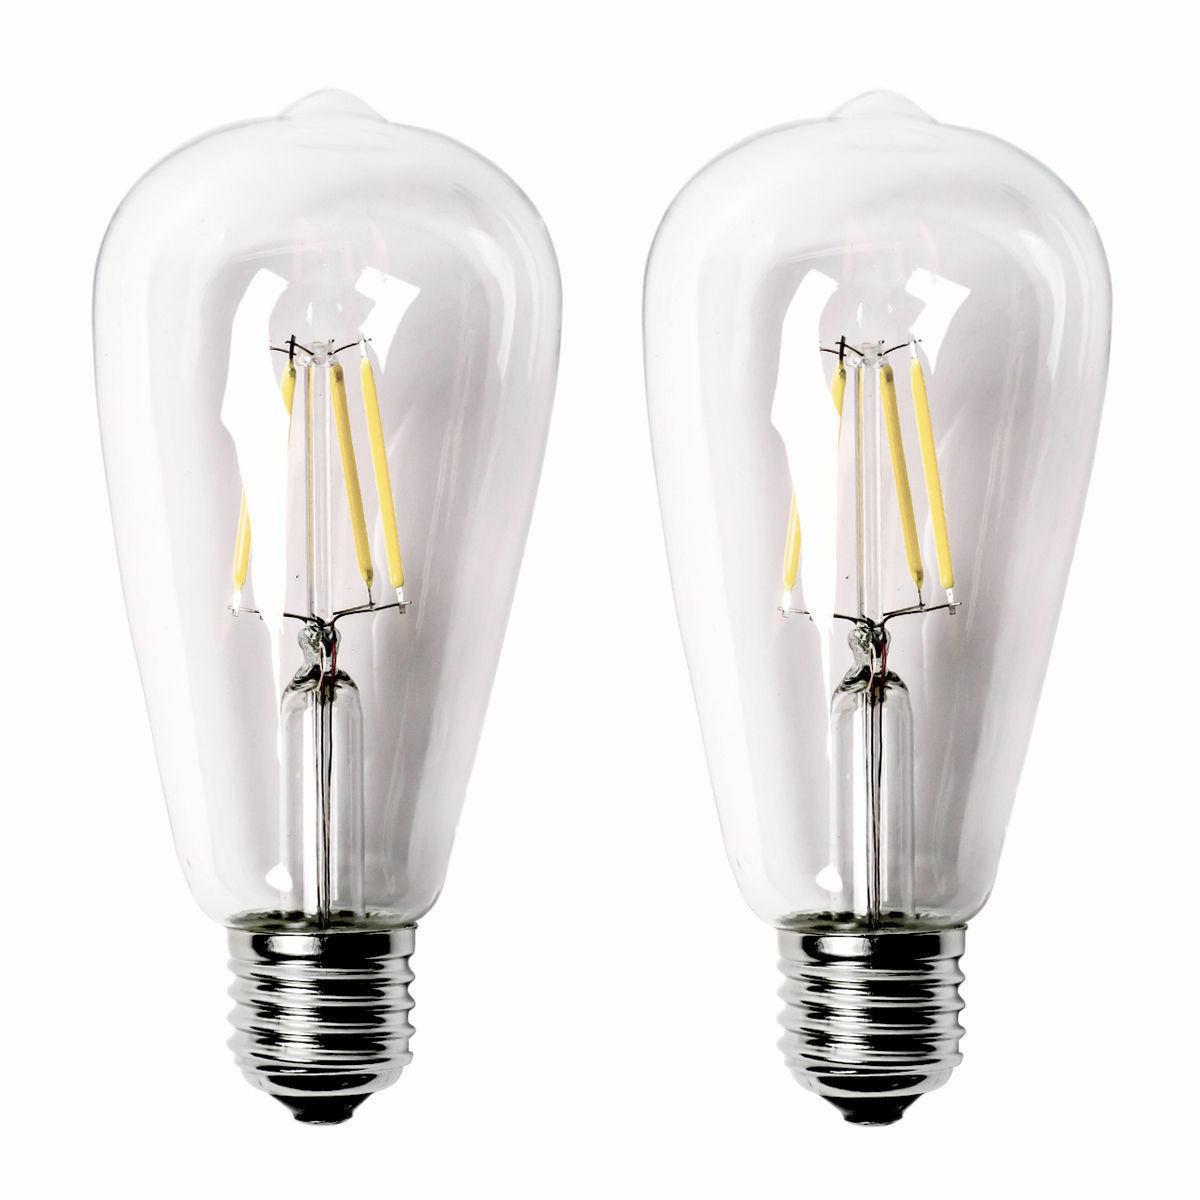 Vintage Bulb Light Lamp